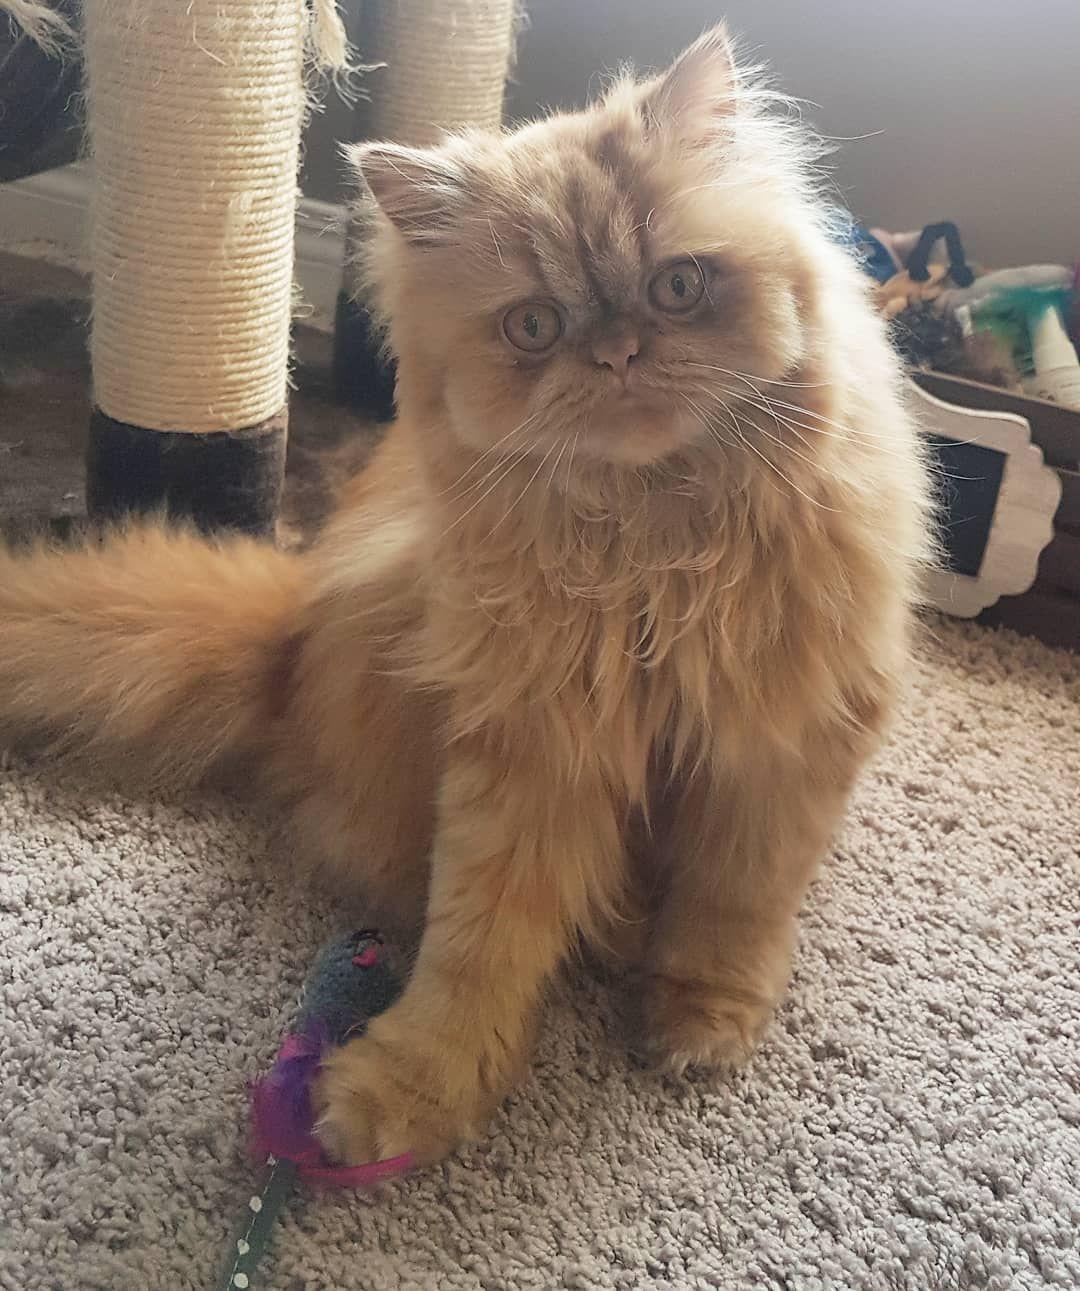 Hi friends!!! . . . . #persian #cat #cute #catsofinstagram #persiansofinstagram #persiancatlovers #cutecat #cutepets #rescuecat #catlovers #cutestcatever #pictureoftheday #catmodel #cats #adoptdontshop #kitten #kitty #photogenic #smooshface #grumpyface #love #instacat #instapet #animallover #buzzfeedanimals #dailyfluff #catoftheday #grumpycat #Excellent_Kittens #BESTCATS_OFTHEWORLD